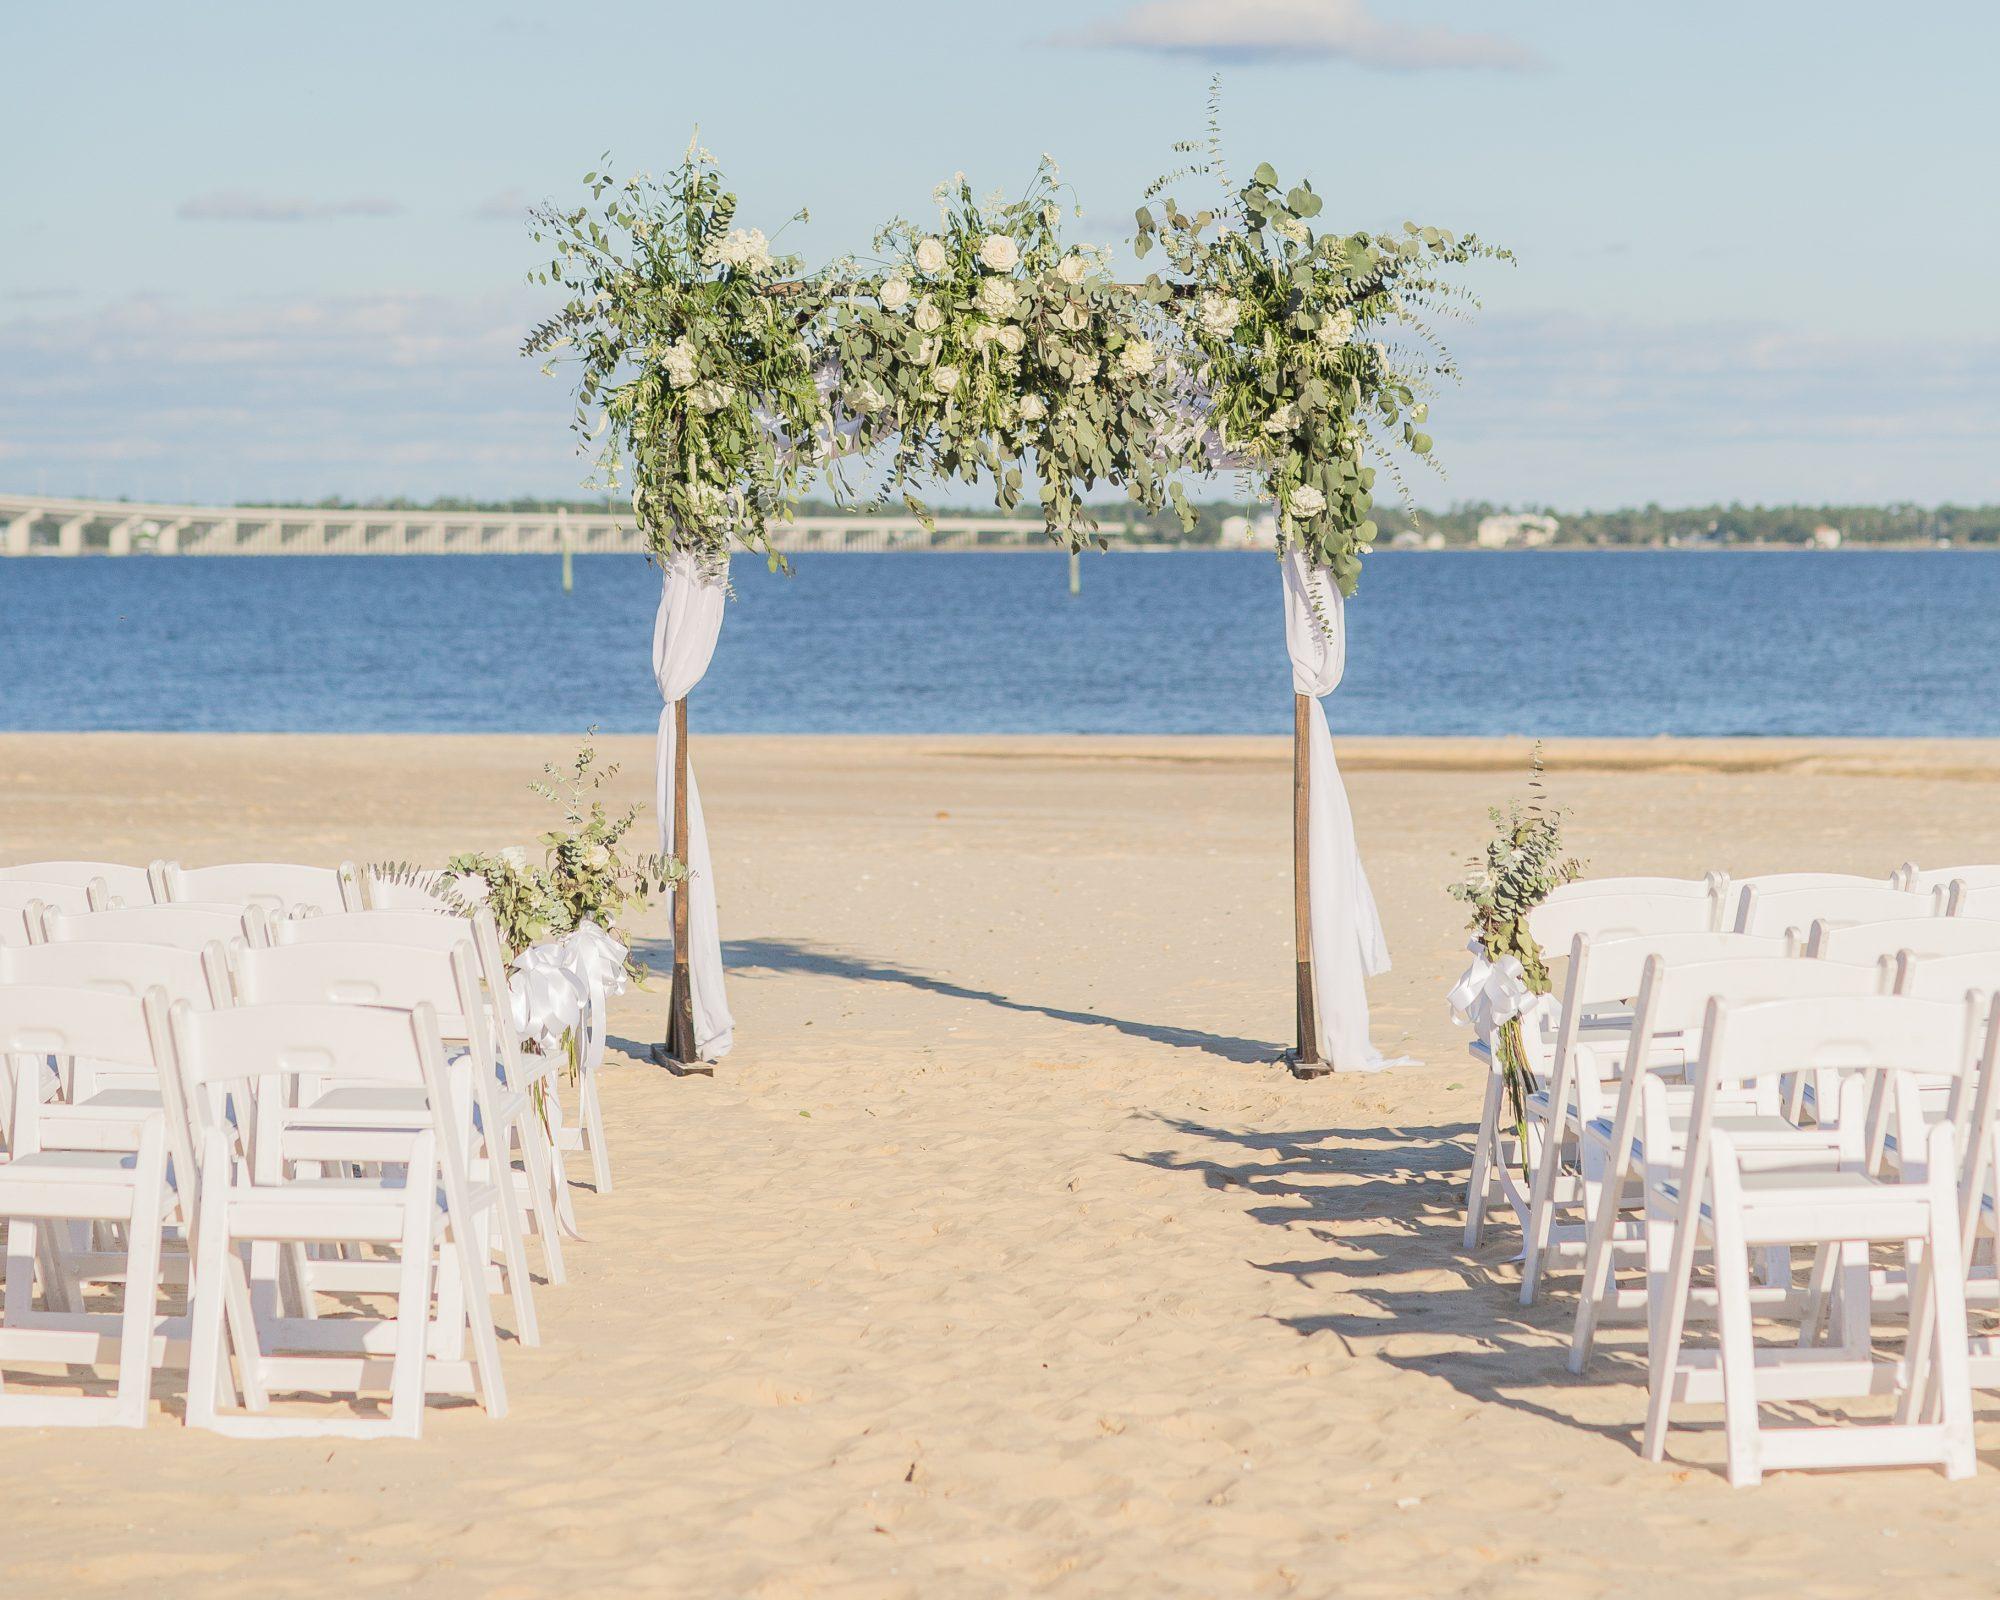 The Beach Wedding Venue